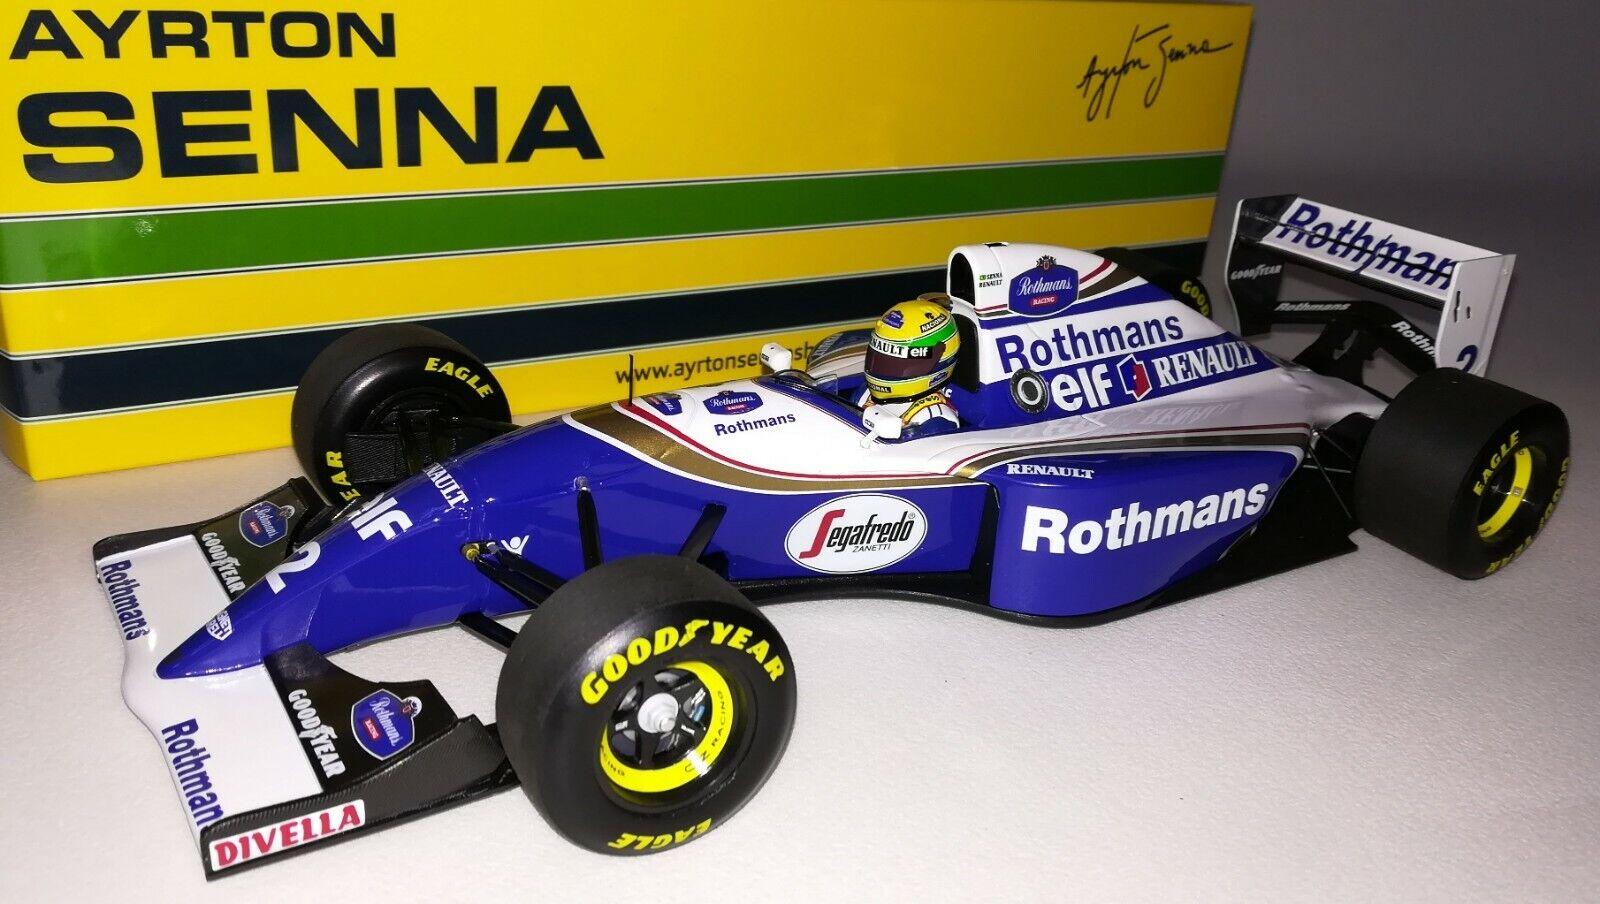 Minichamps F1 Williams Renault FW16 Ayrton Senna 1 18 Brazilian GP 1994 redhmans